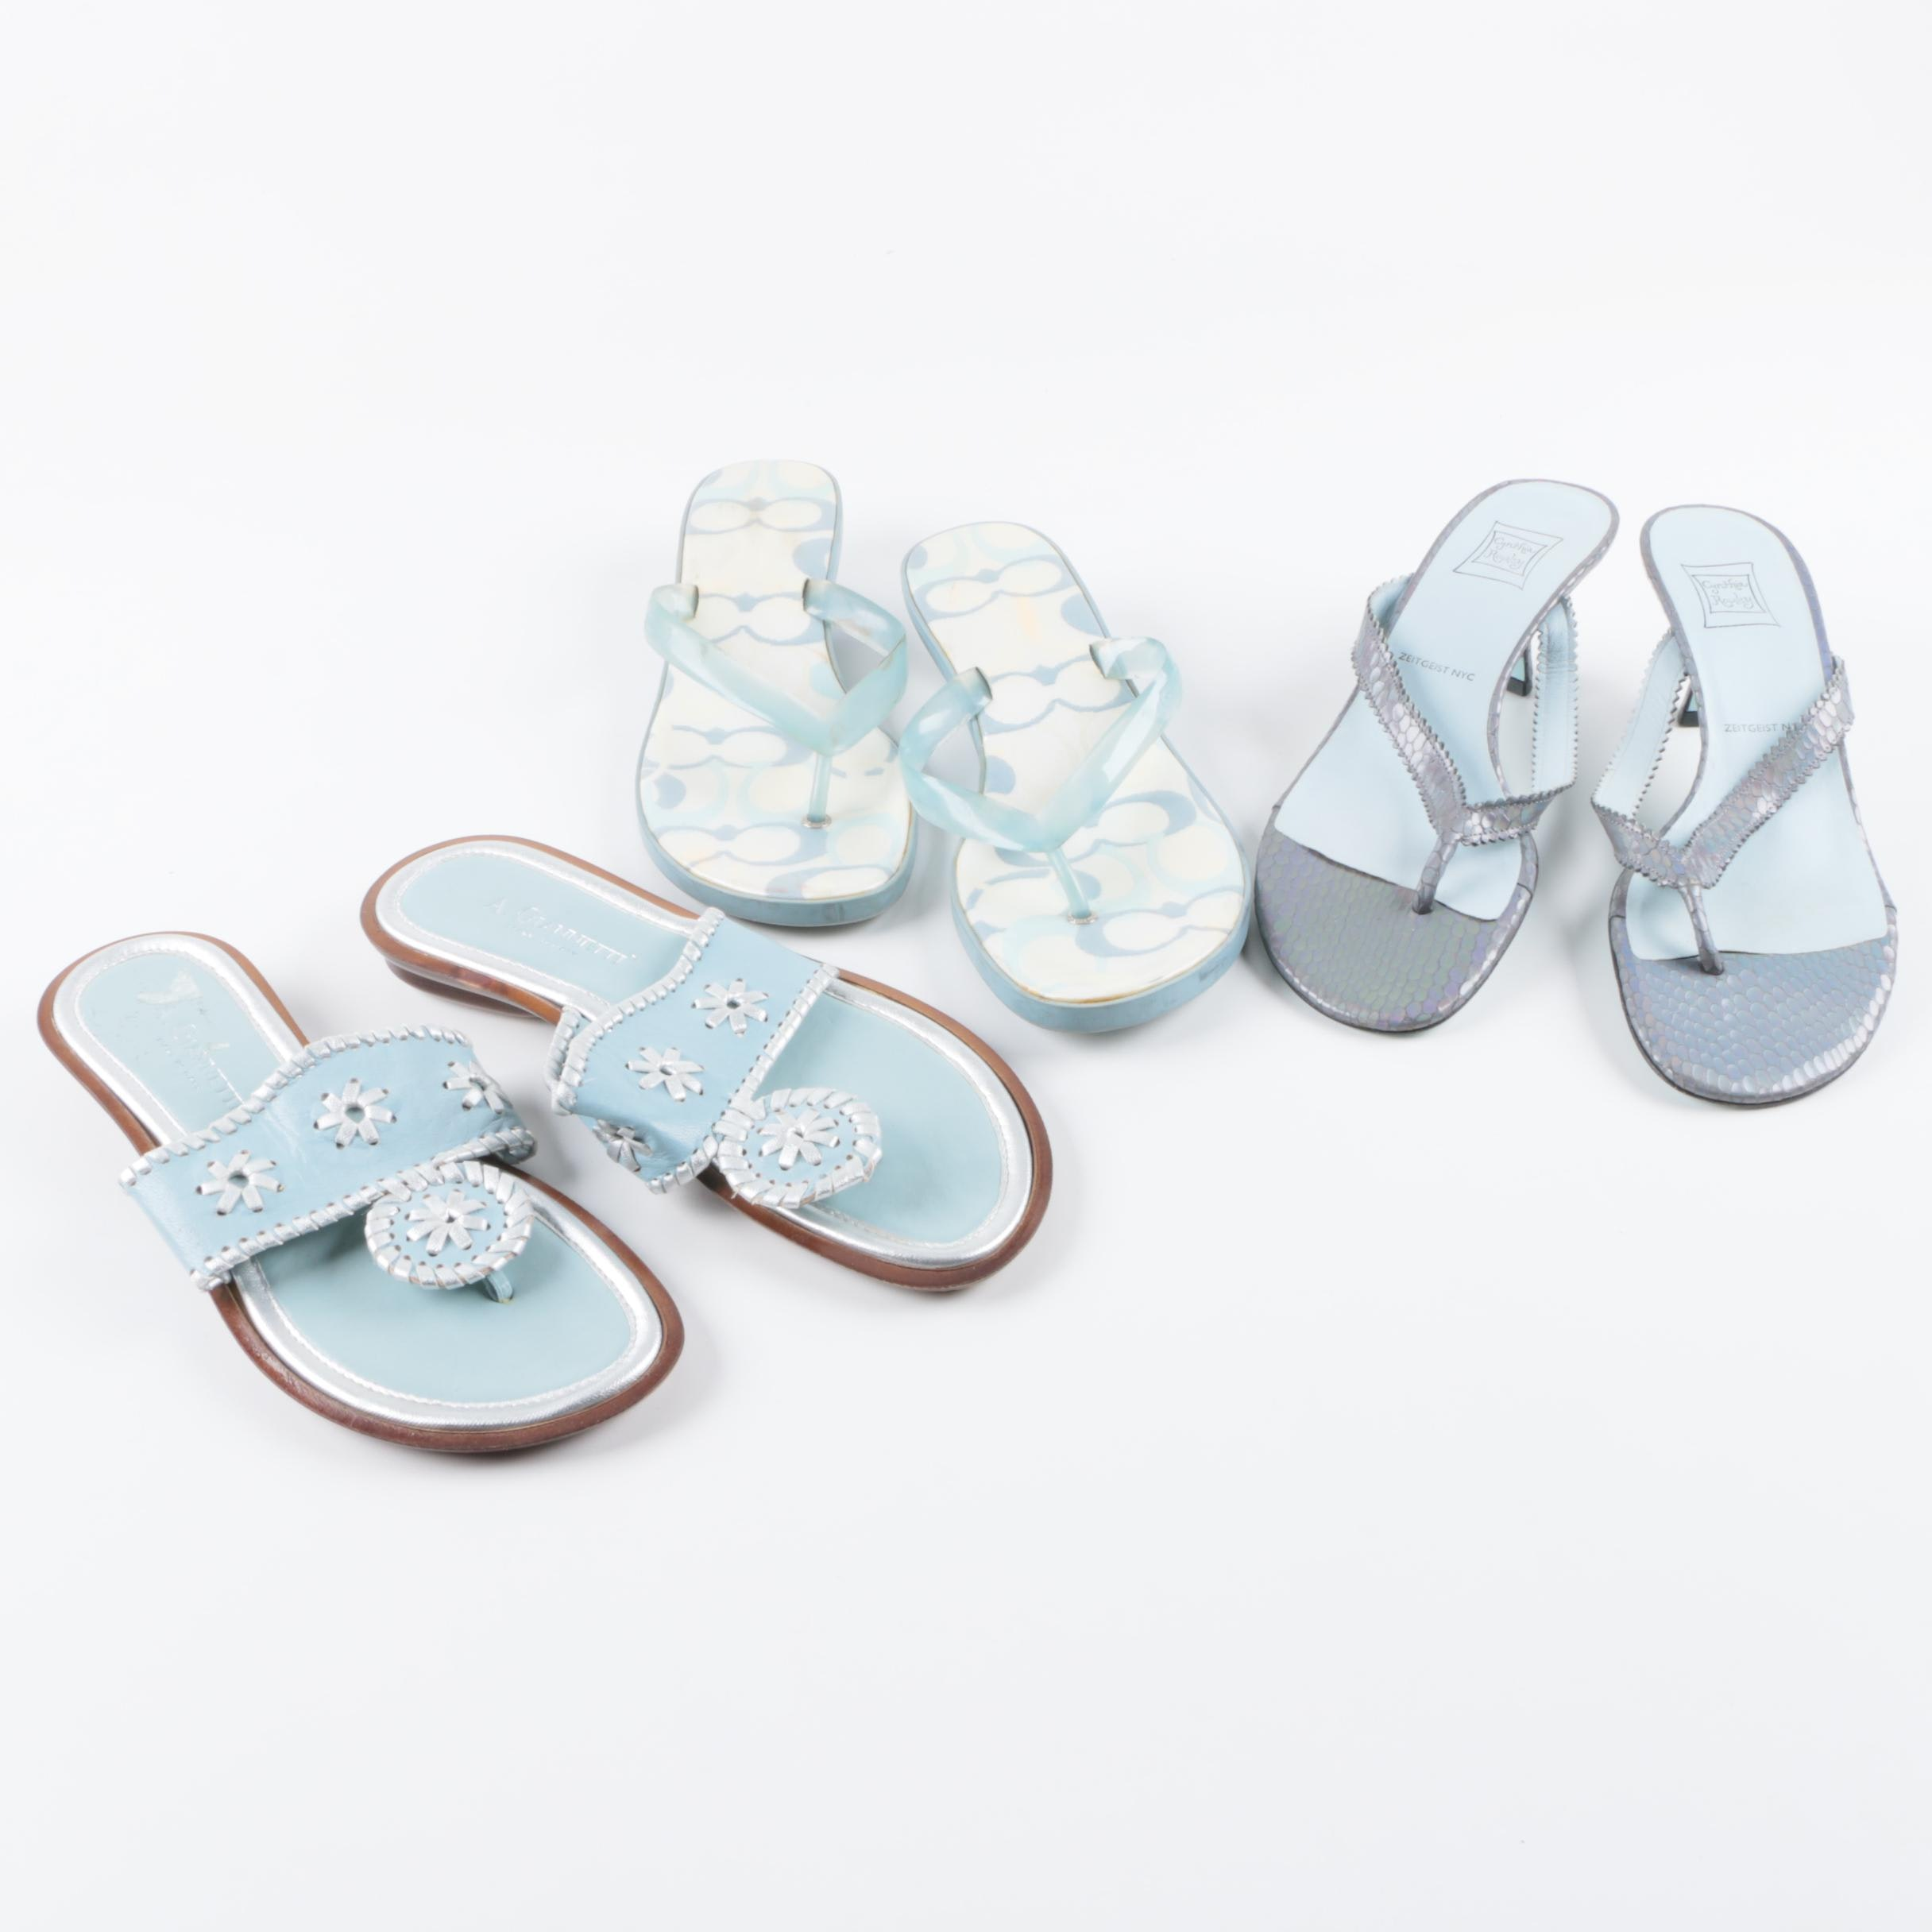 Women's Sandals, Including Cynthia Rowley